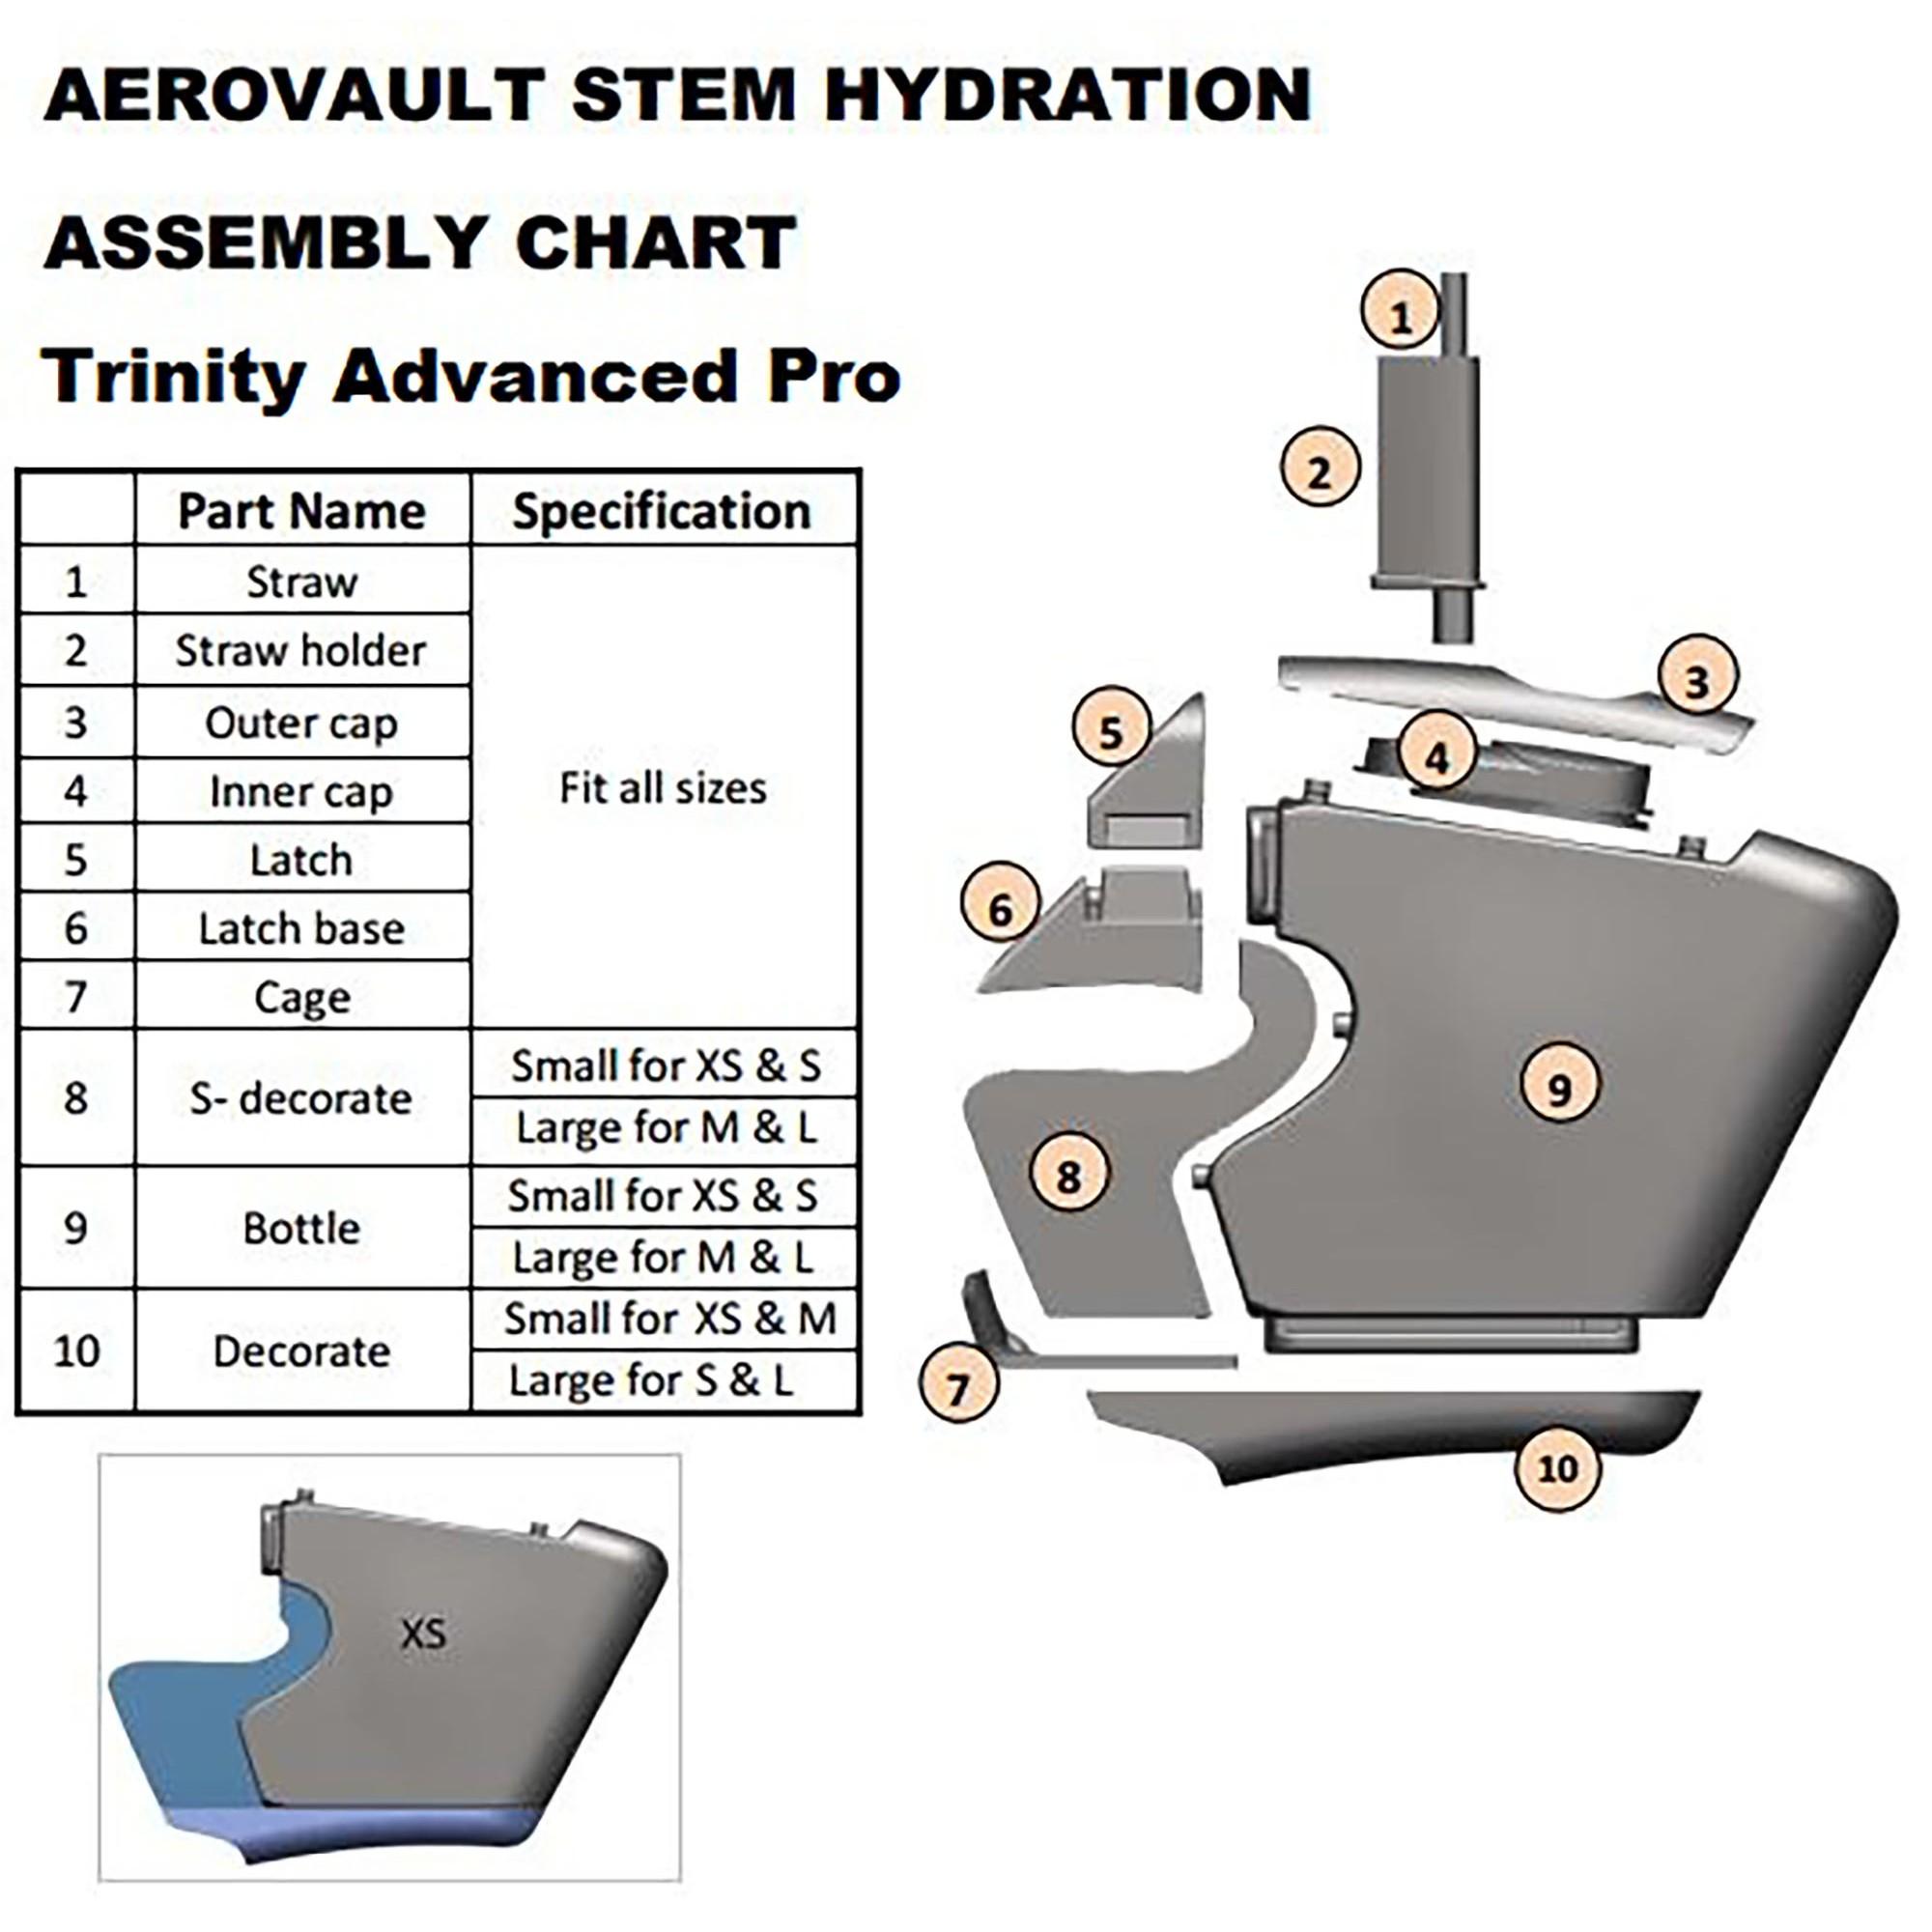 kit bidon aero avant giant trinity advanced pro